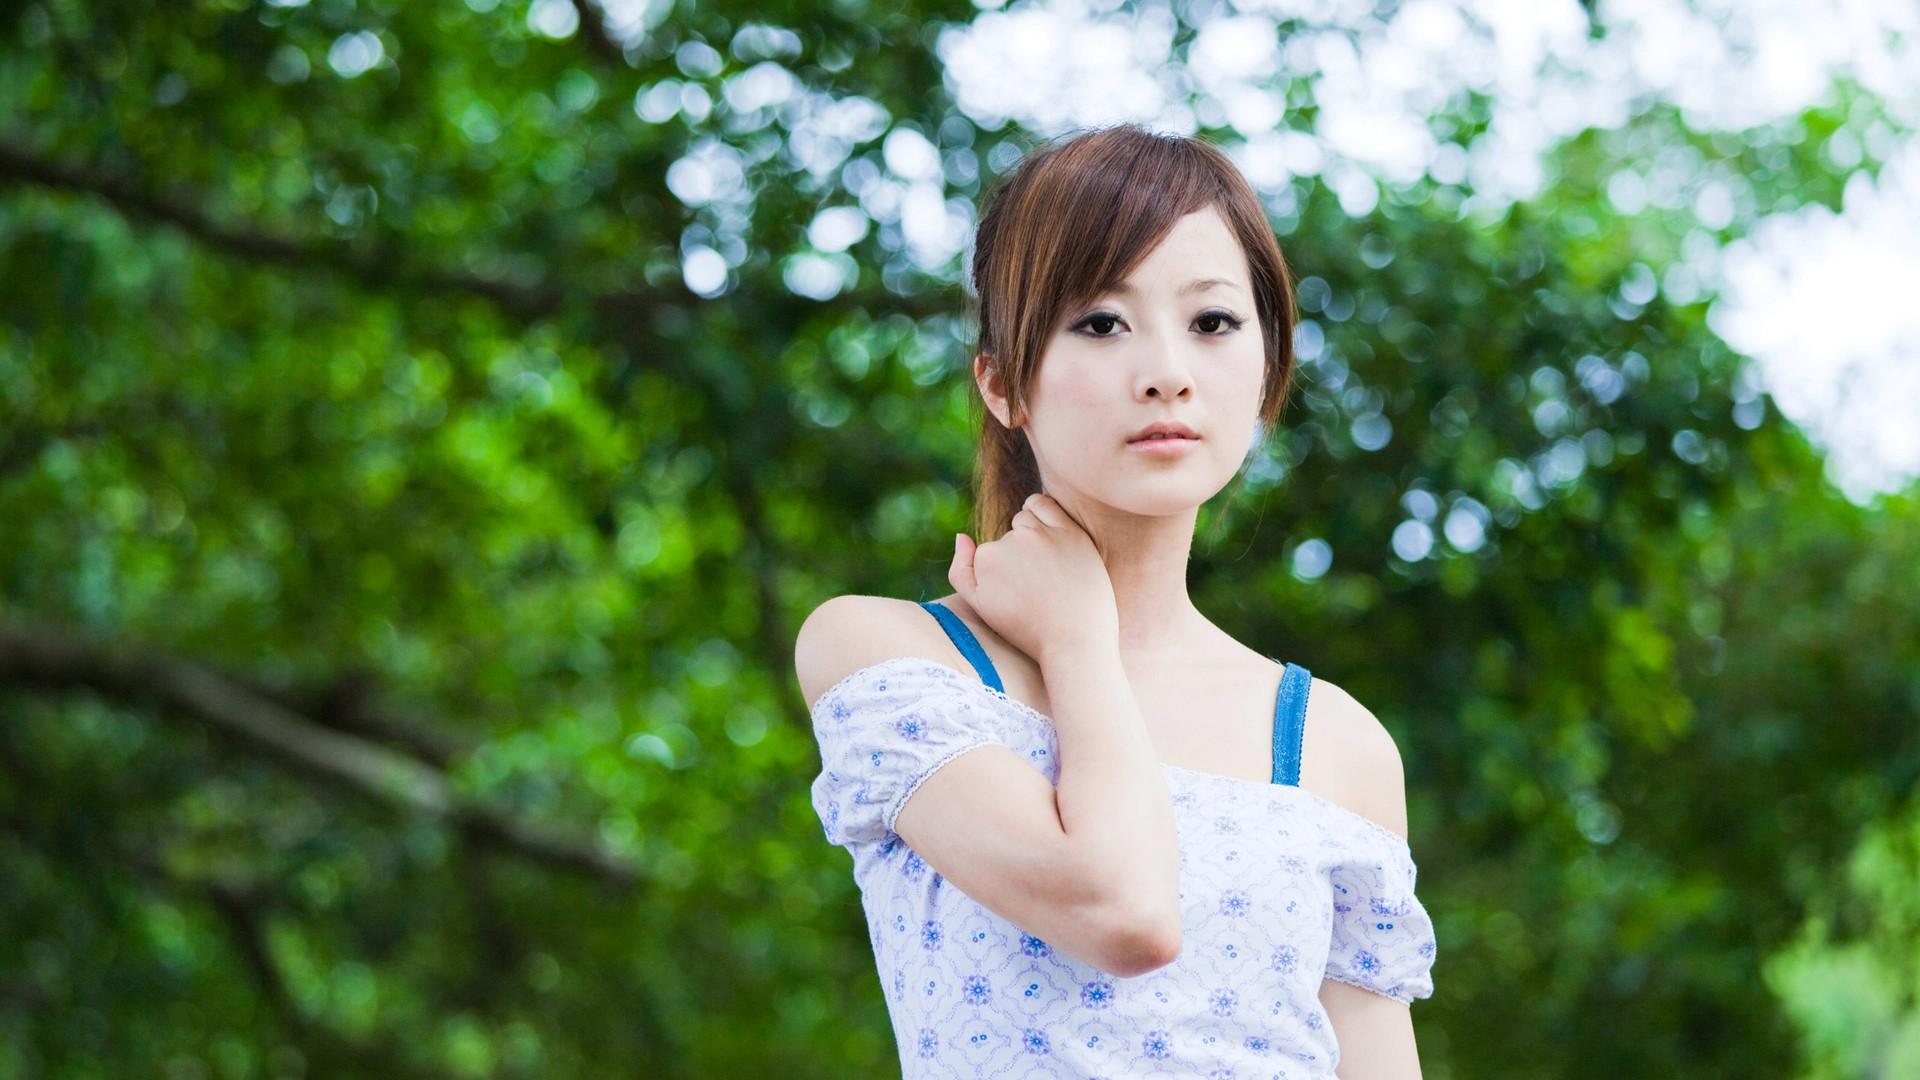 1920x1080 px Attractive Beautiful Beauty Body cute girl